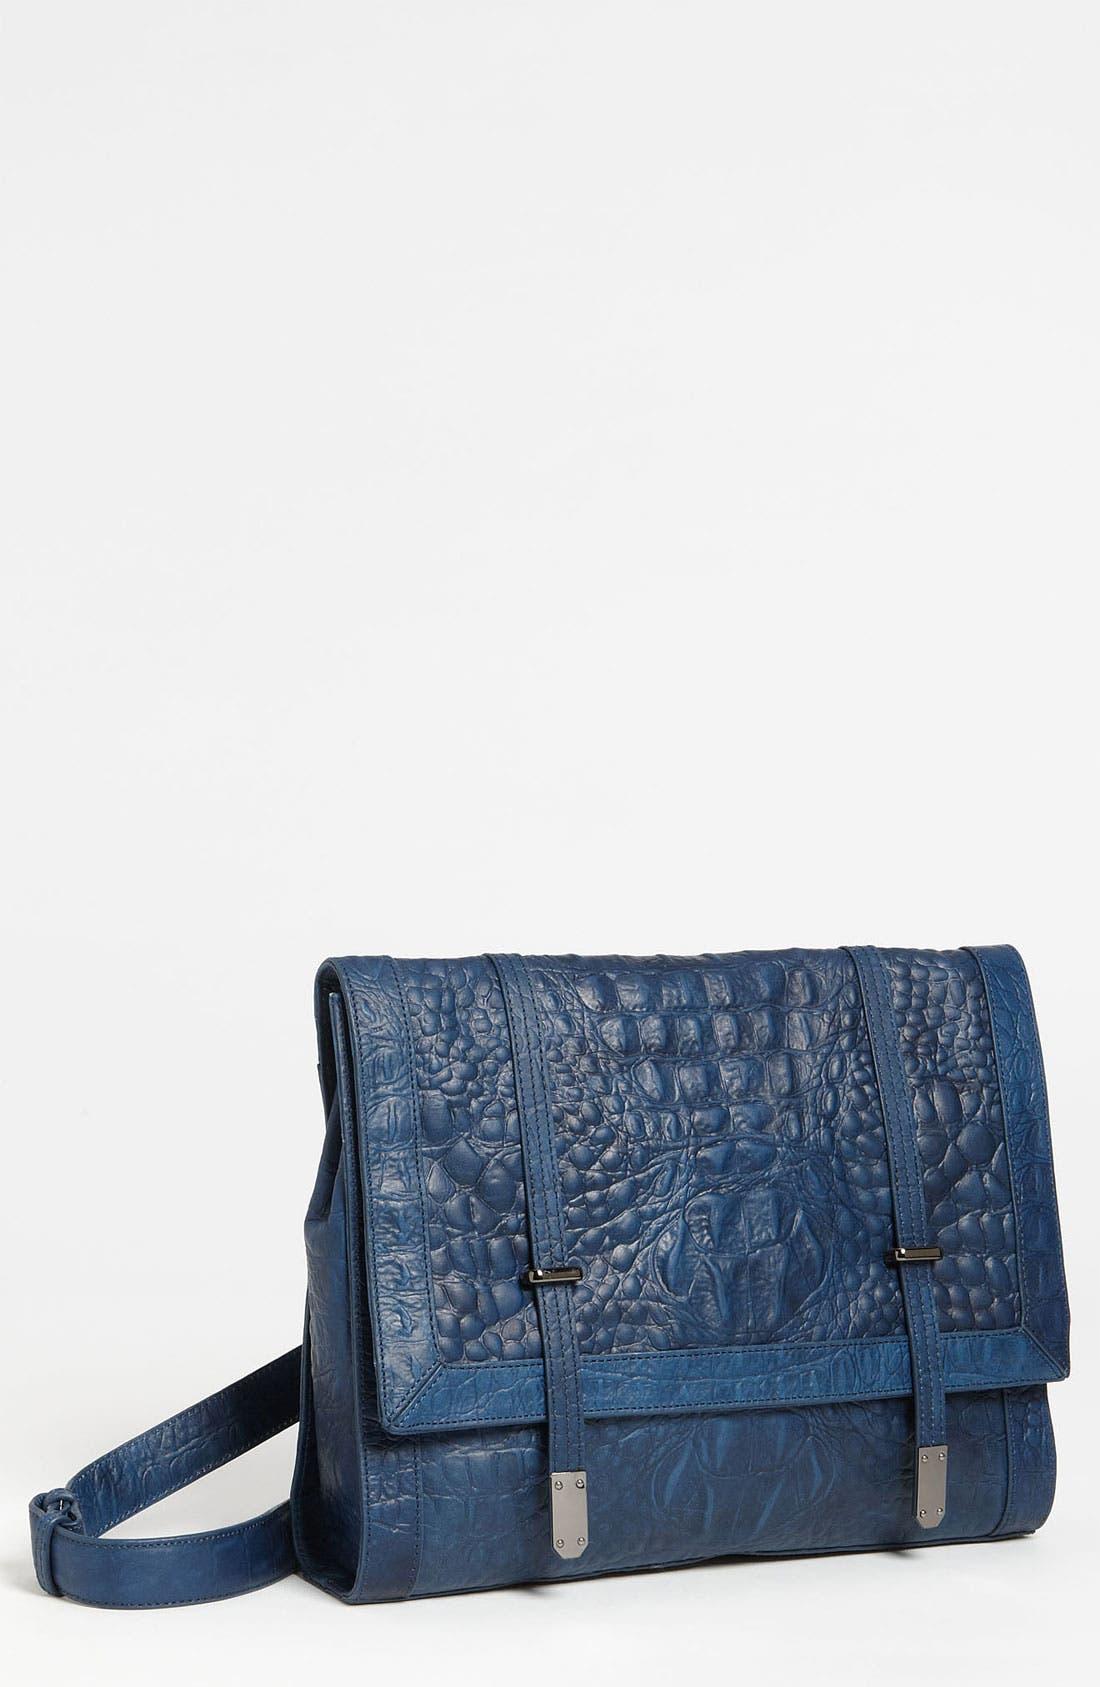 Main Image - Kenneth Cole New York 'Strap Aside' Messenger Bag